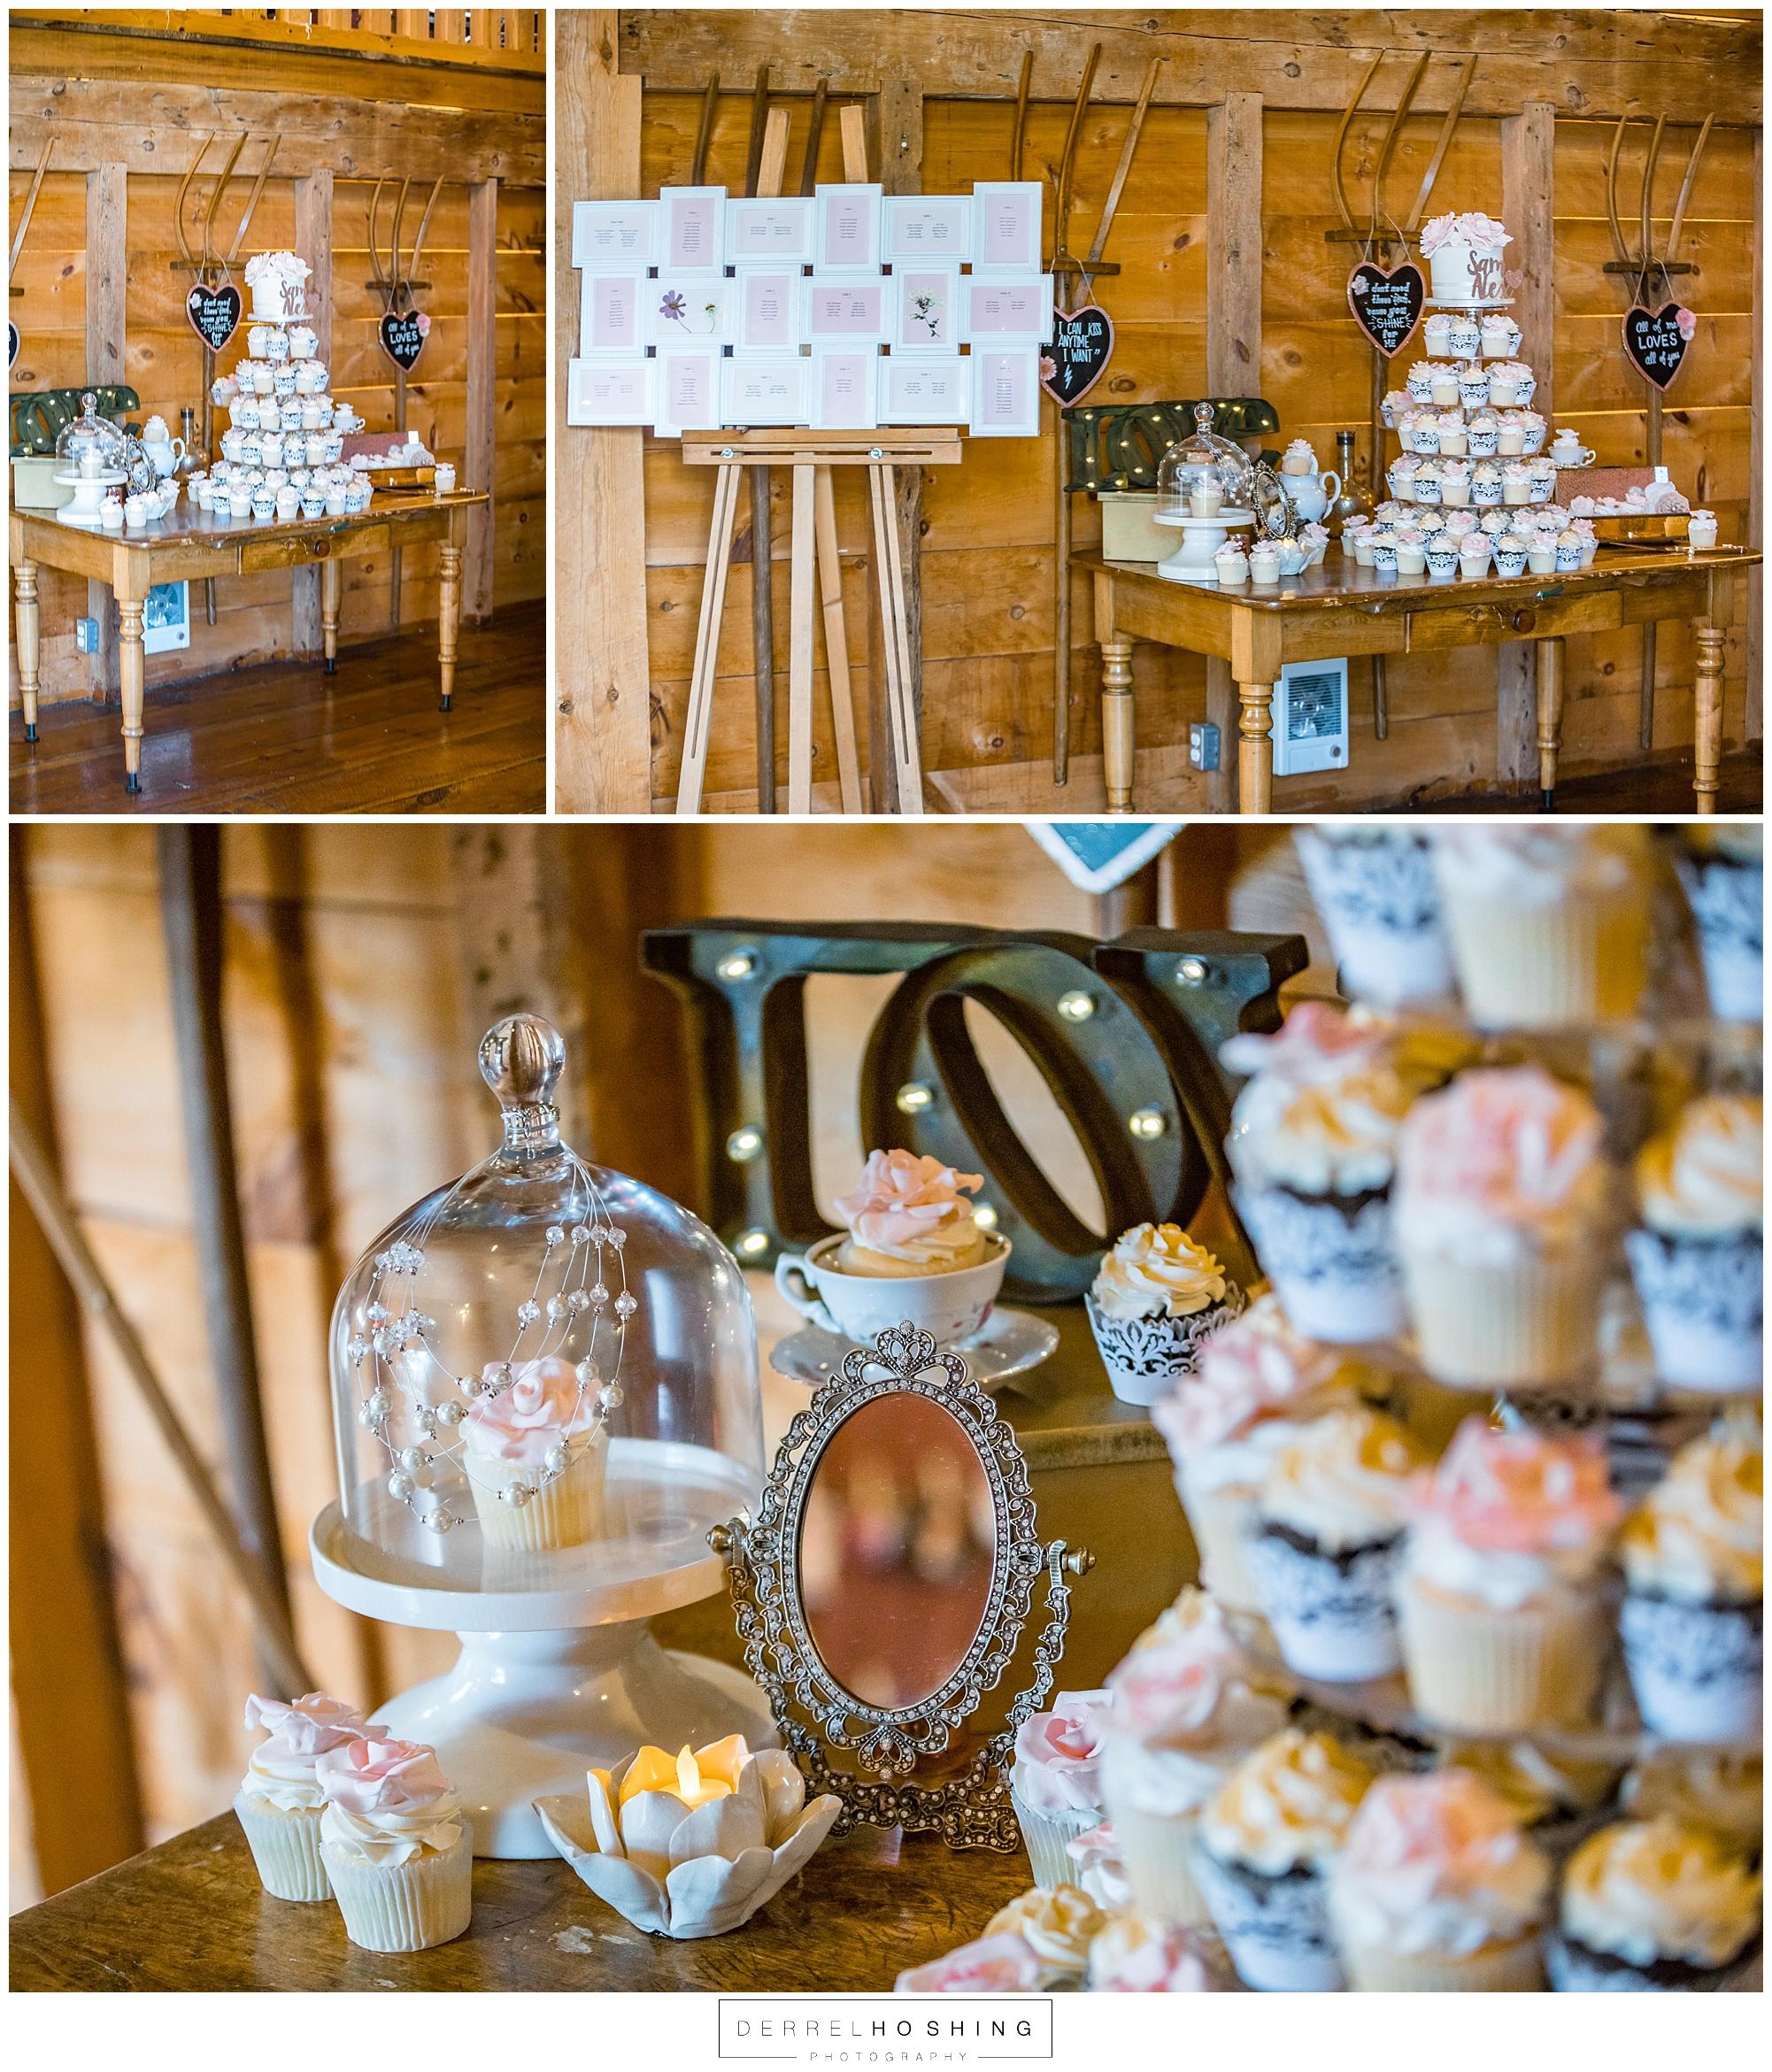 Belcroft-Estates-&-Event-Centre-Wedding-Innisfil-Ontario-0027.jpg